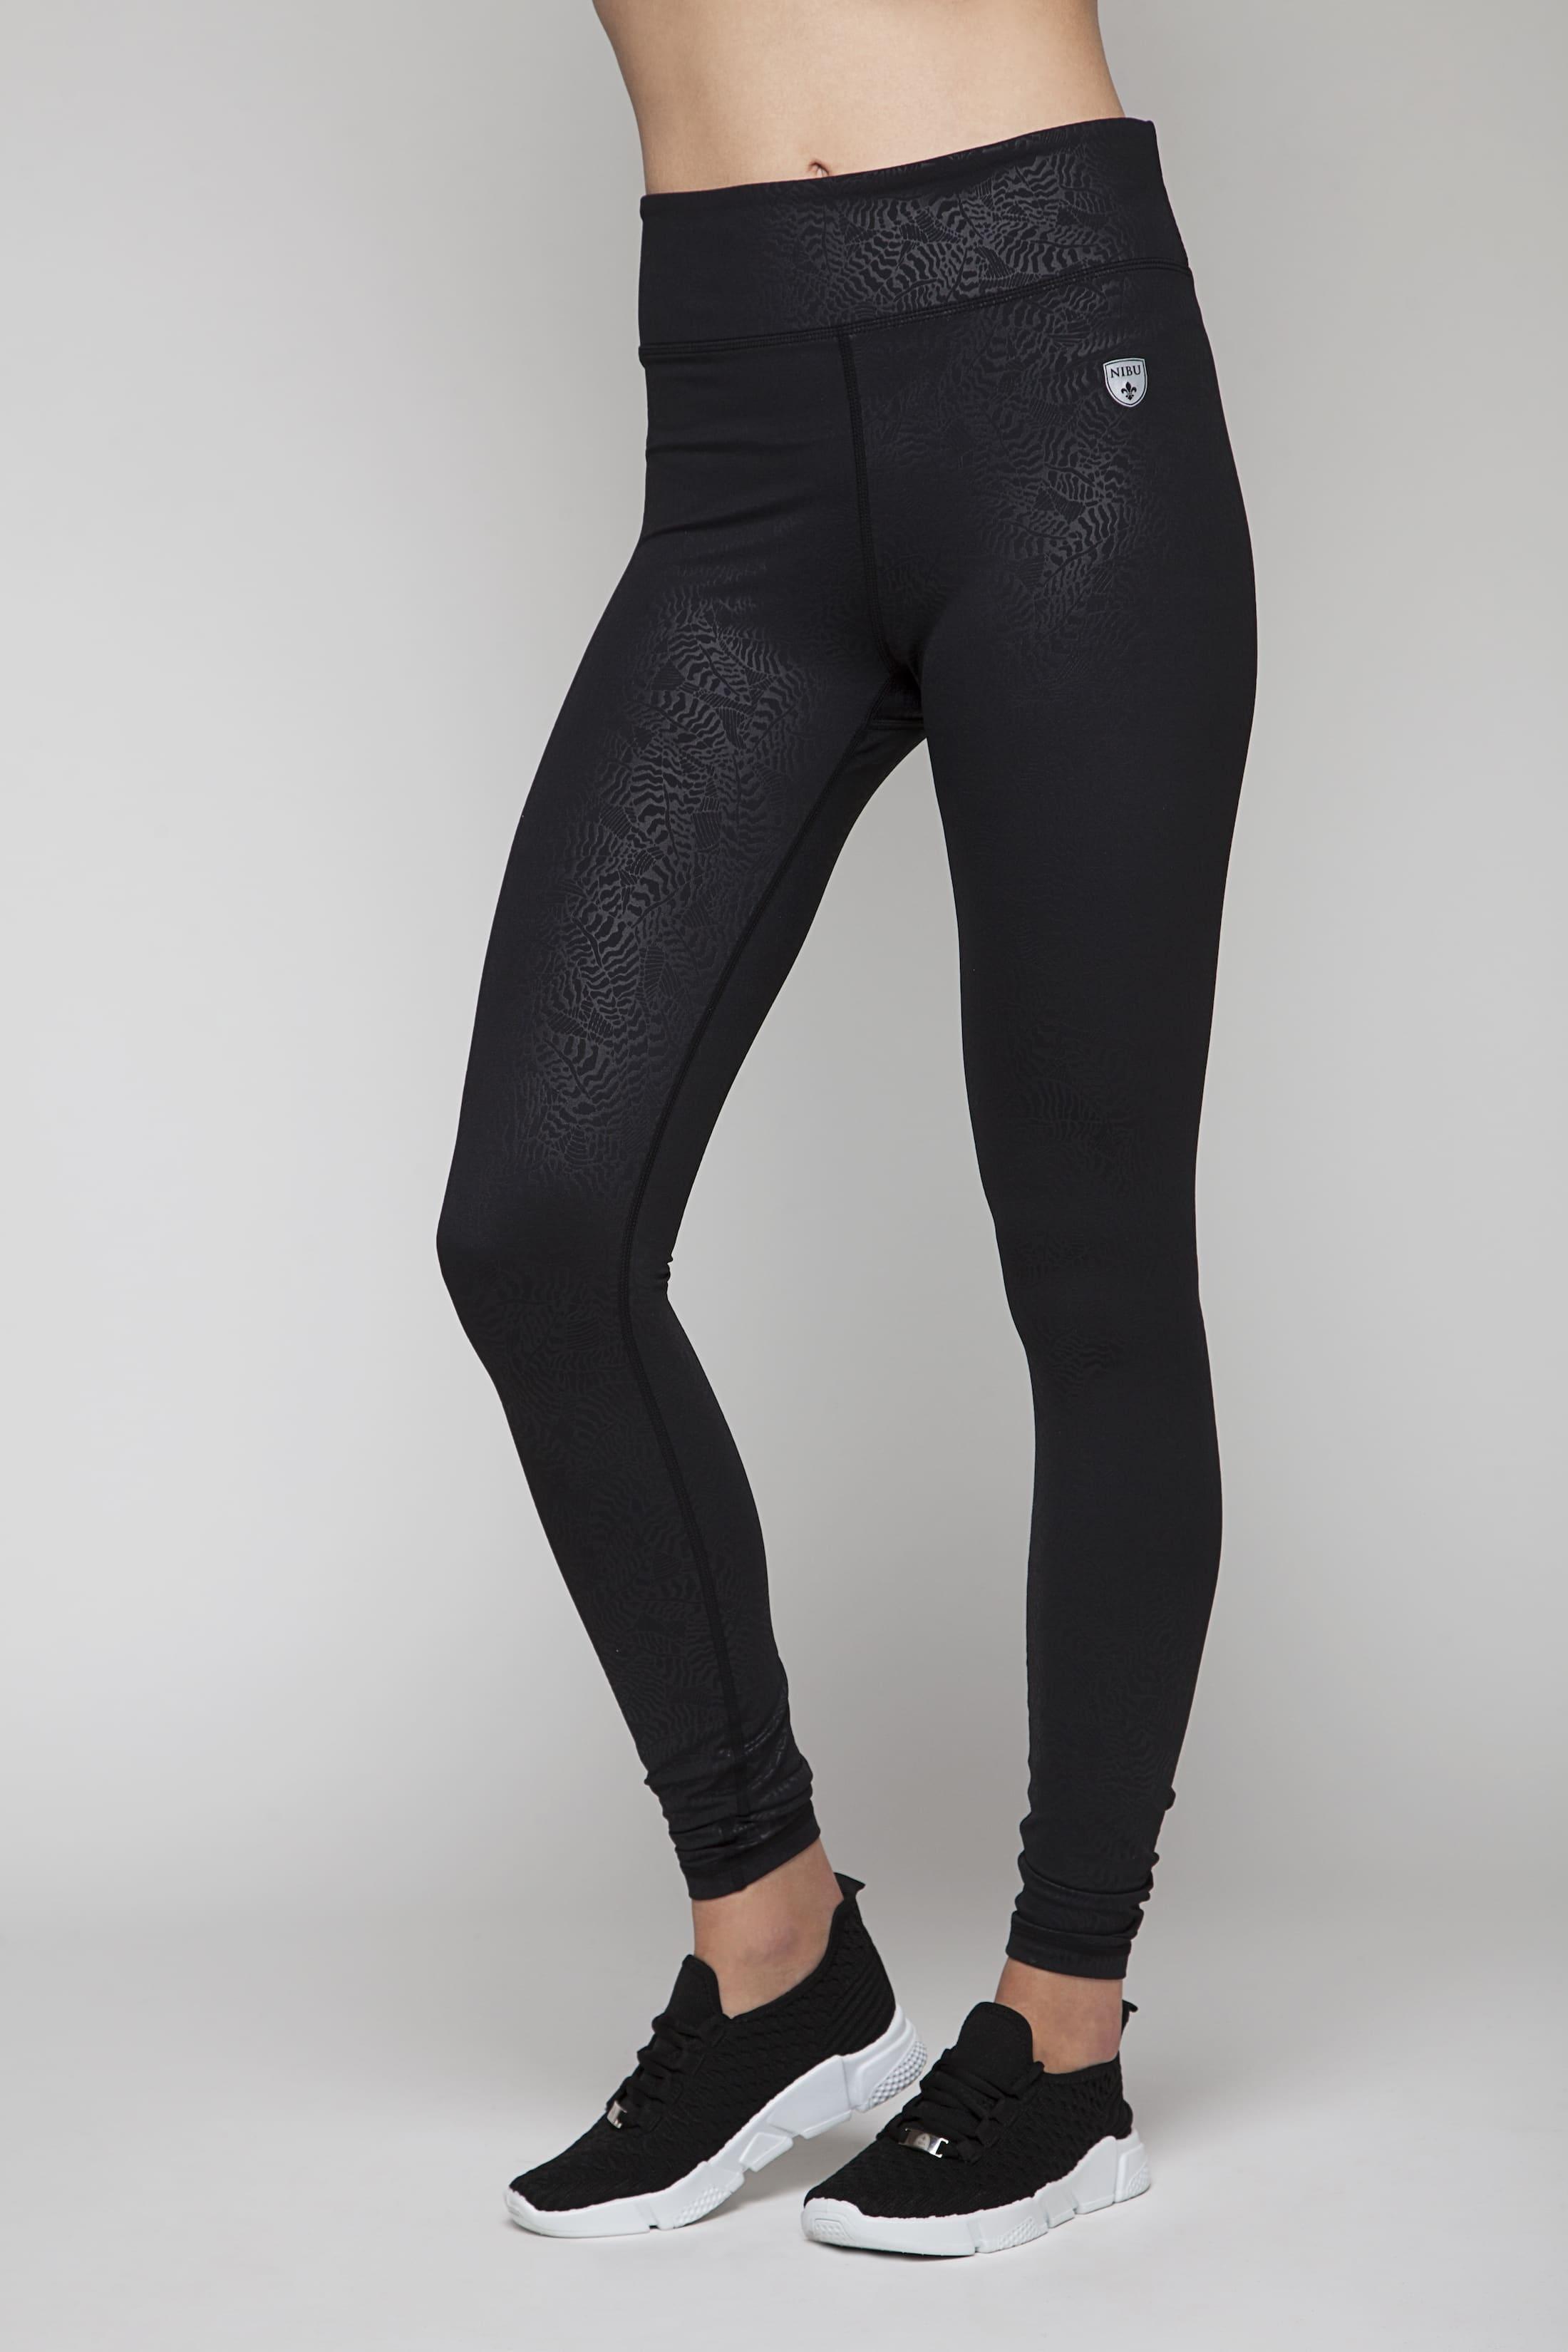 Black soft sport tights with pattern (squat safe)